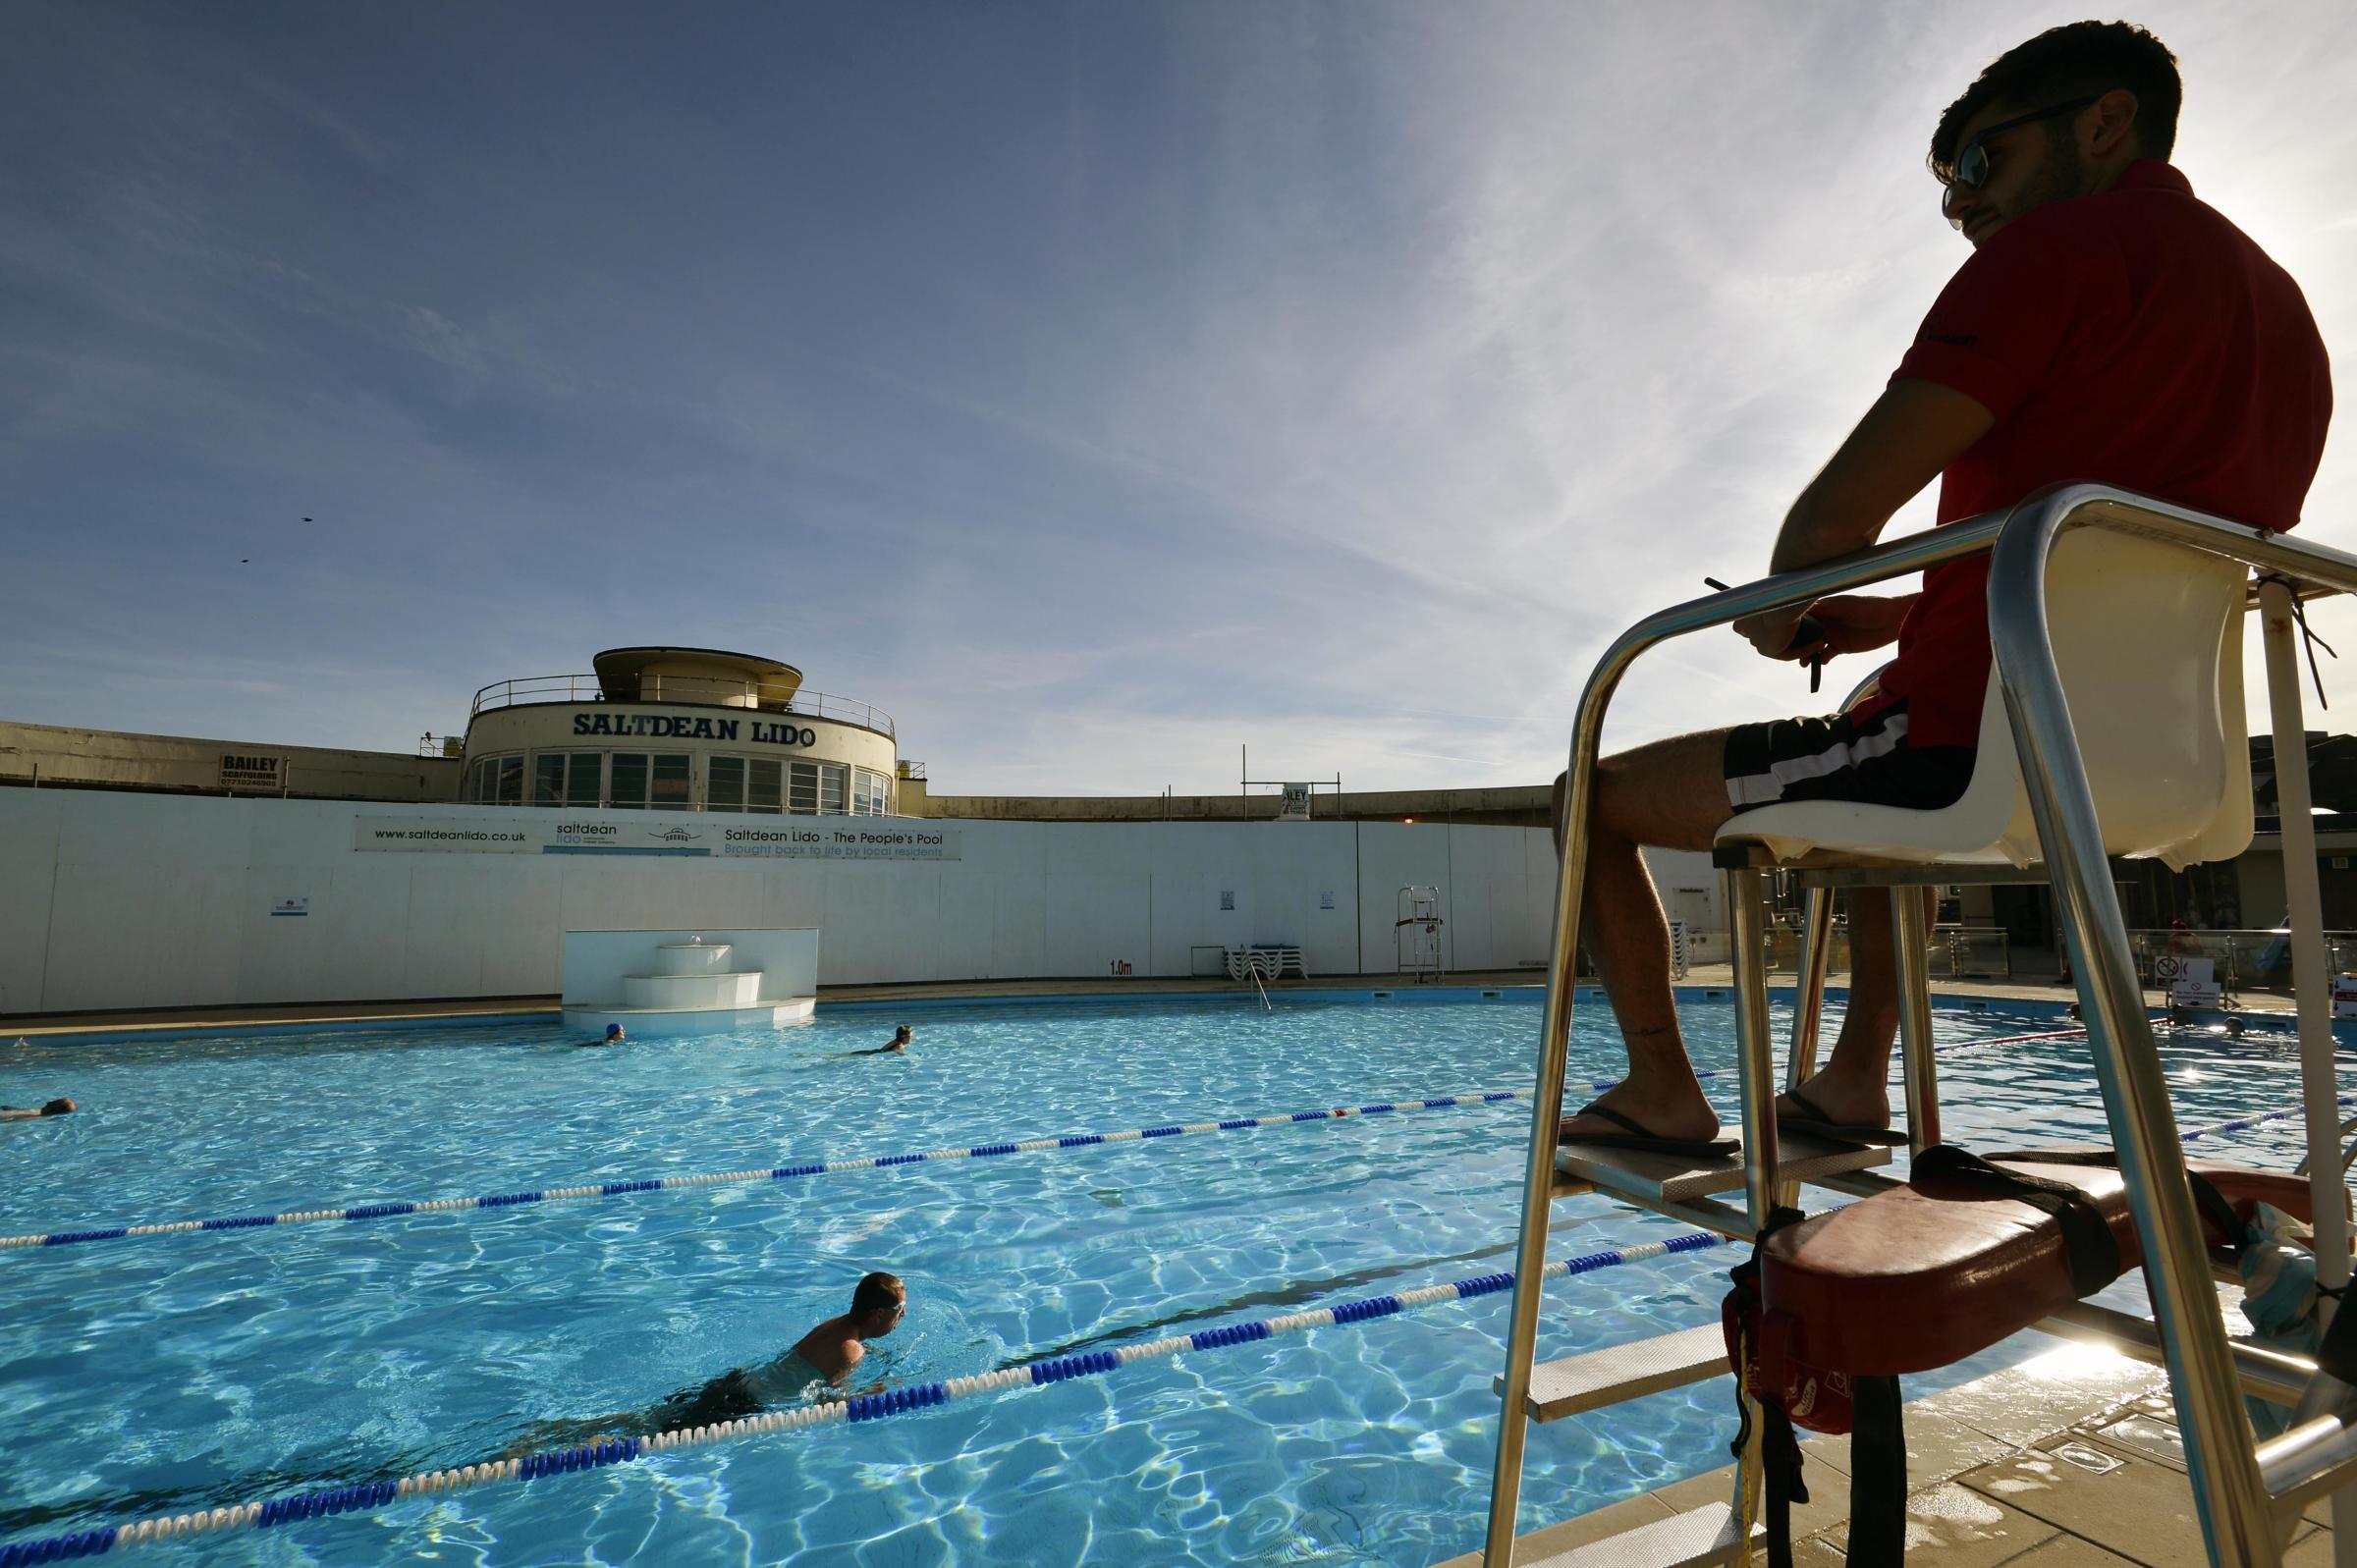 Pool of funding unlocked for Saltdean Lido restoration